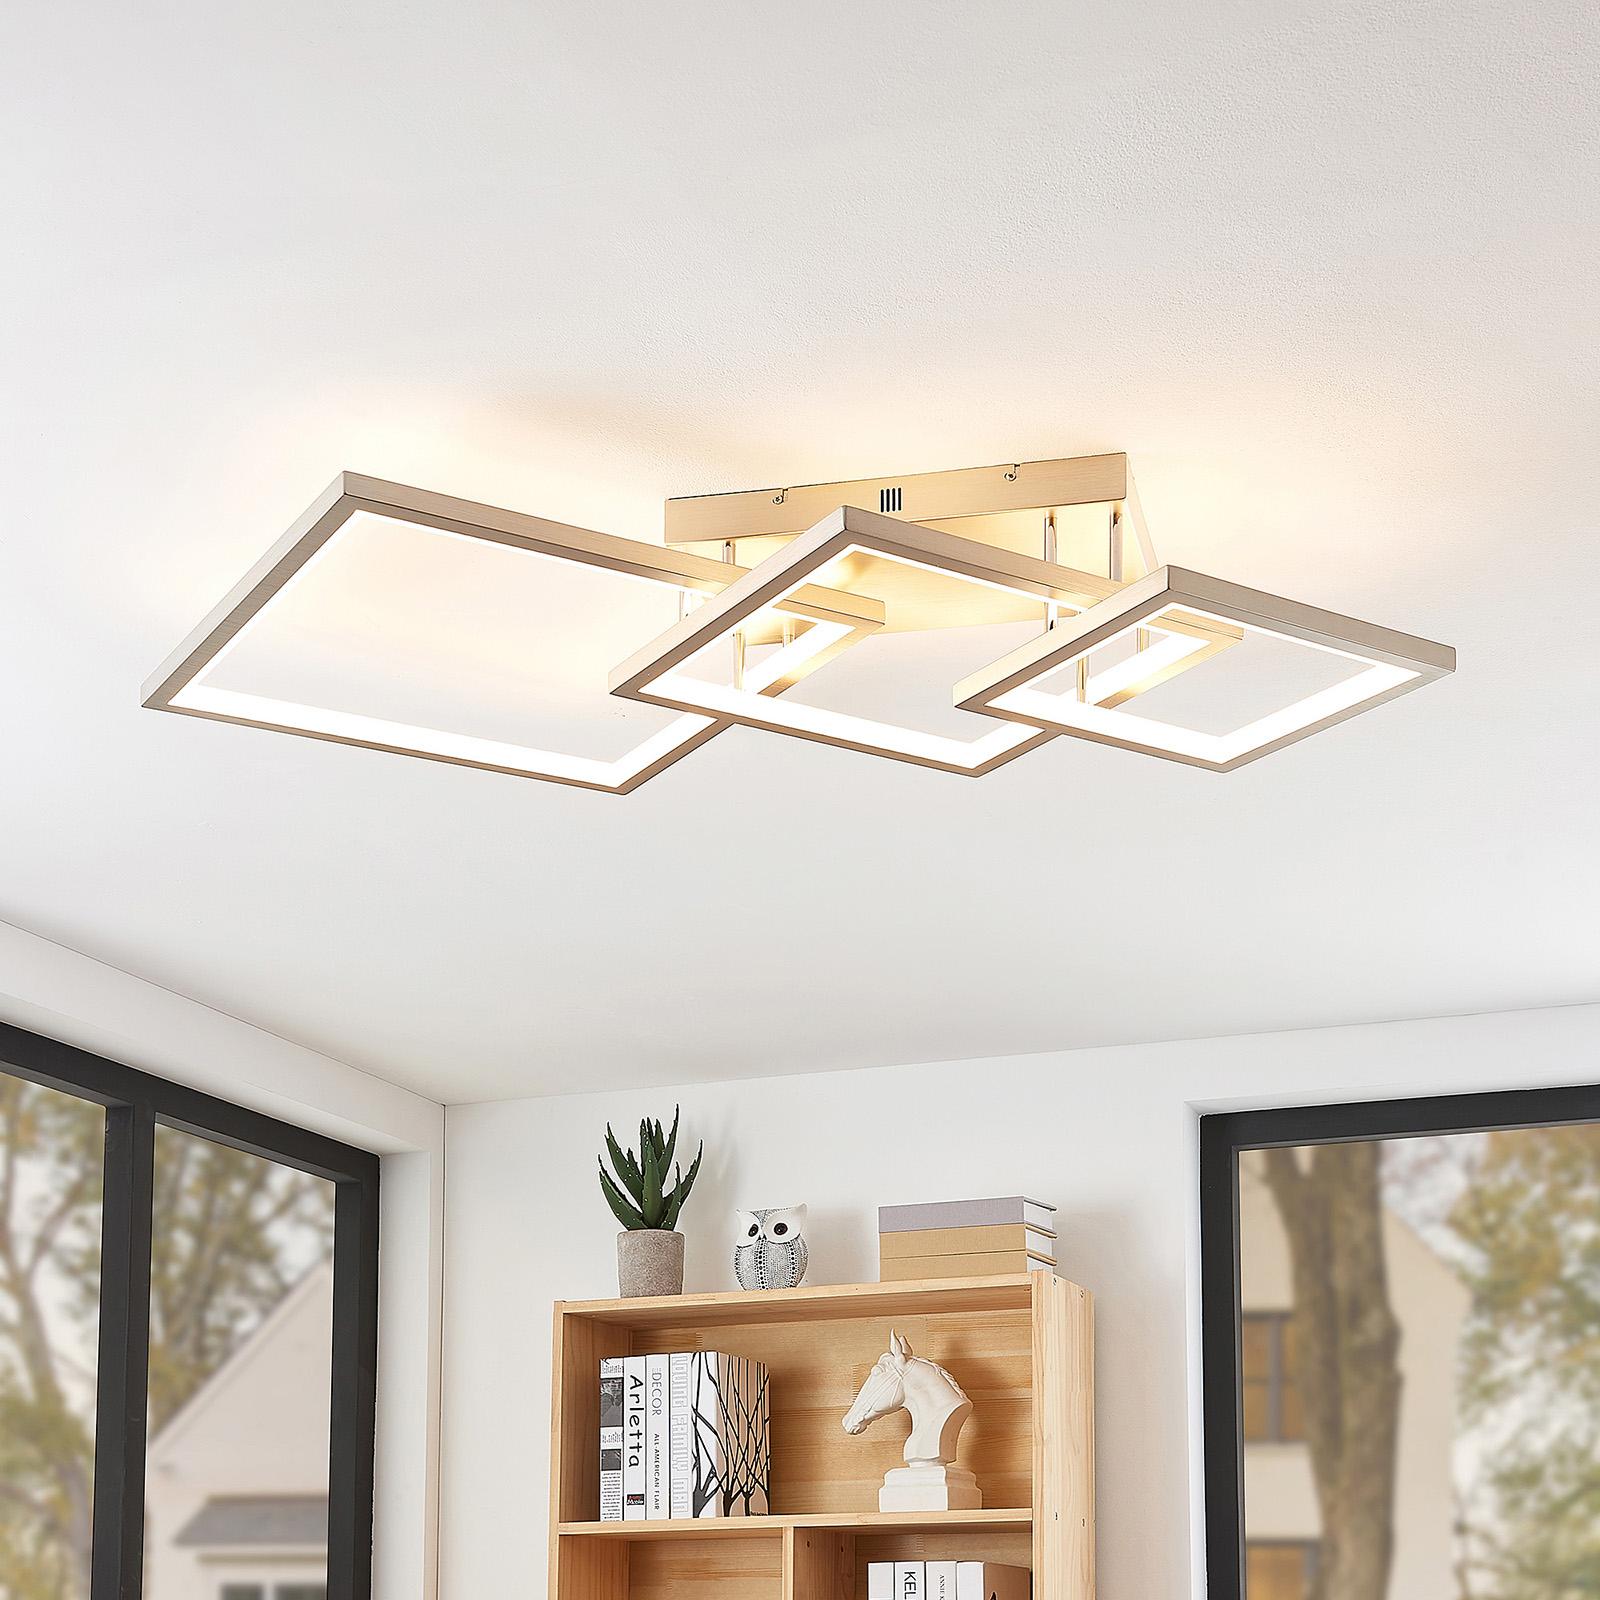 Lucande Avilara LED plafondlamp van 3 vierkanten